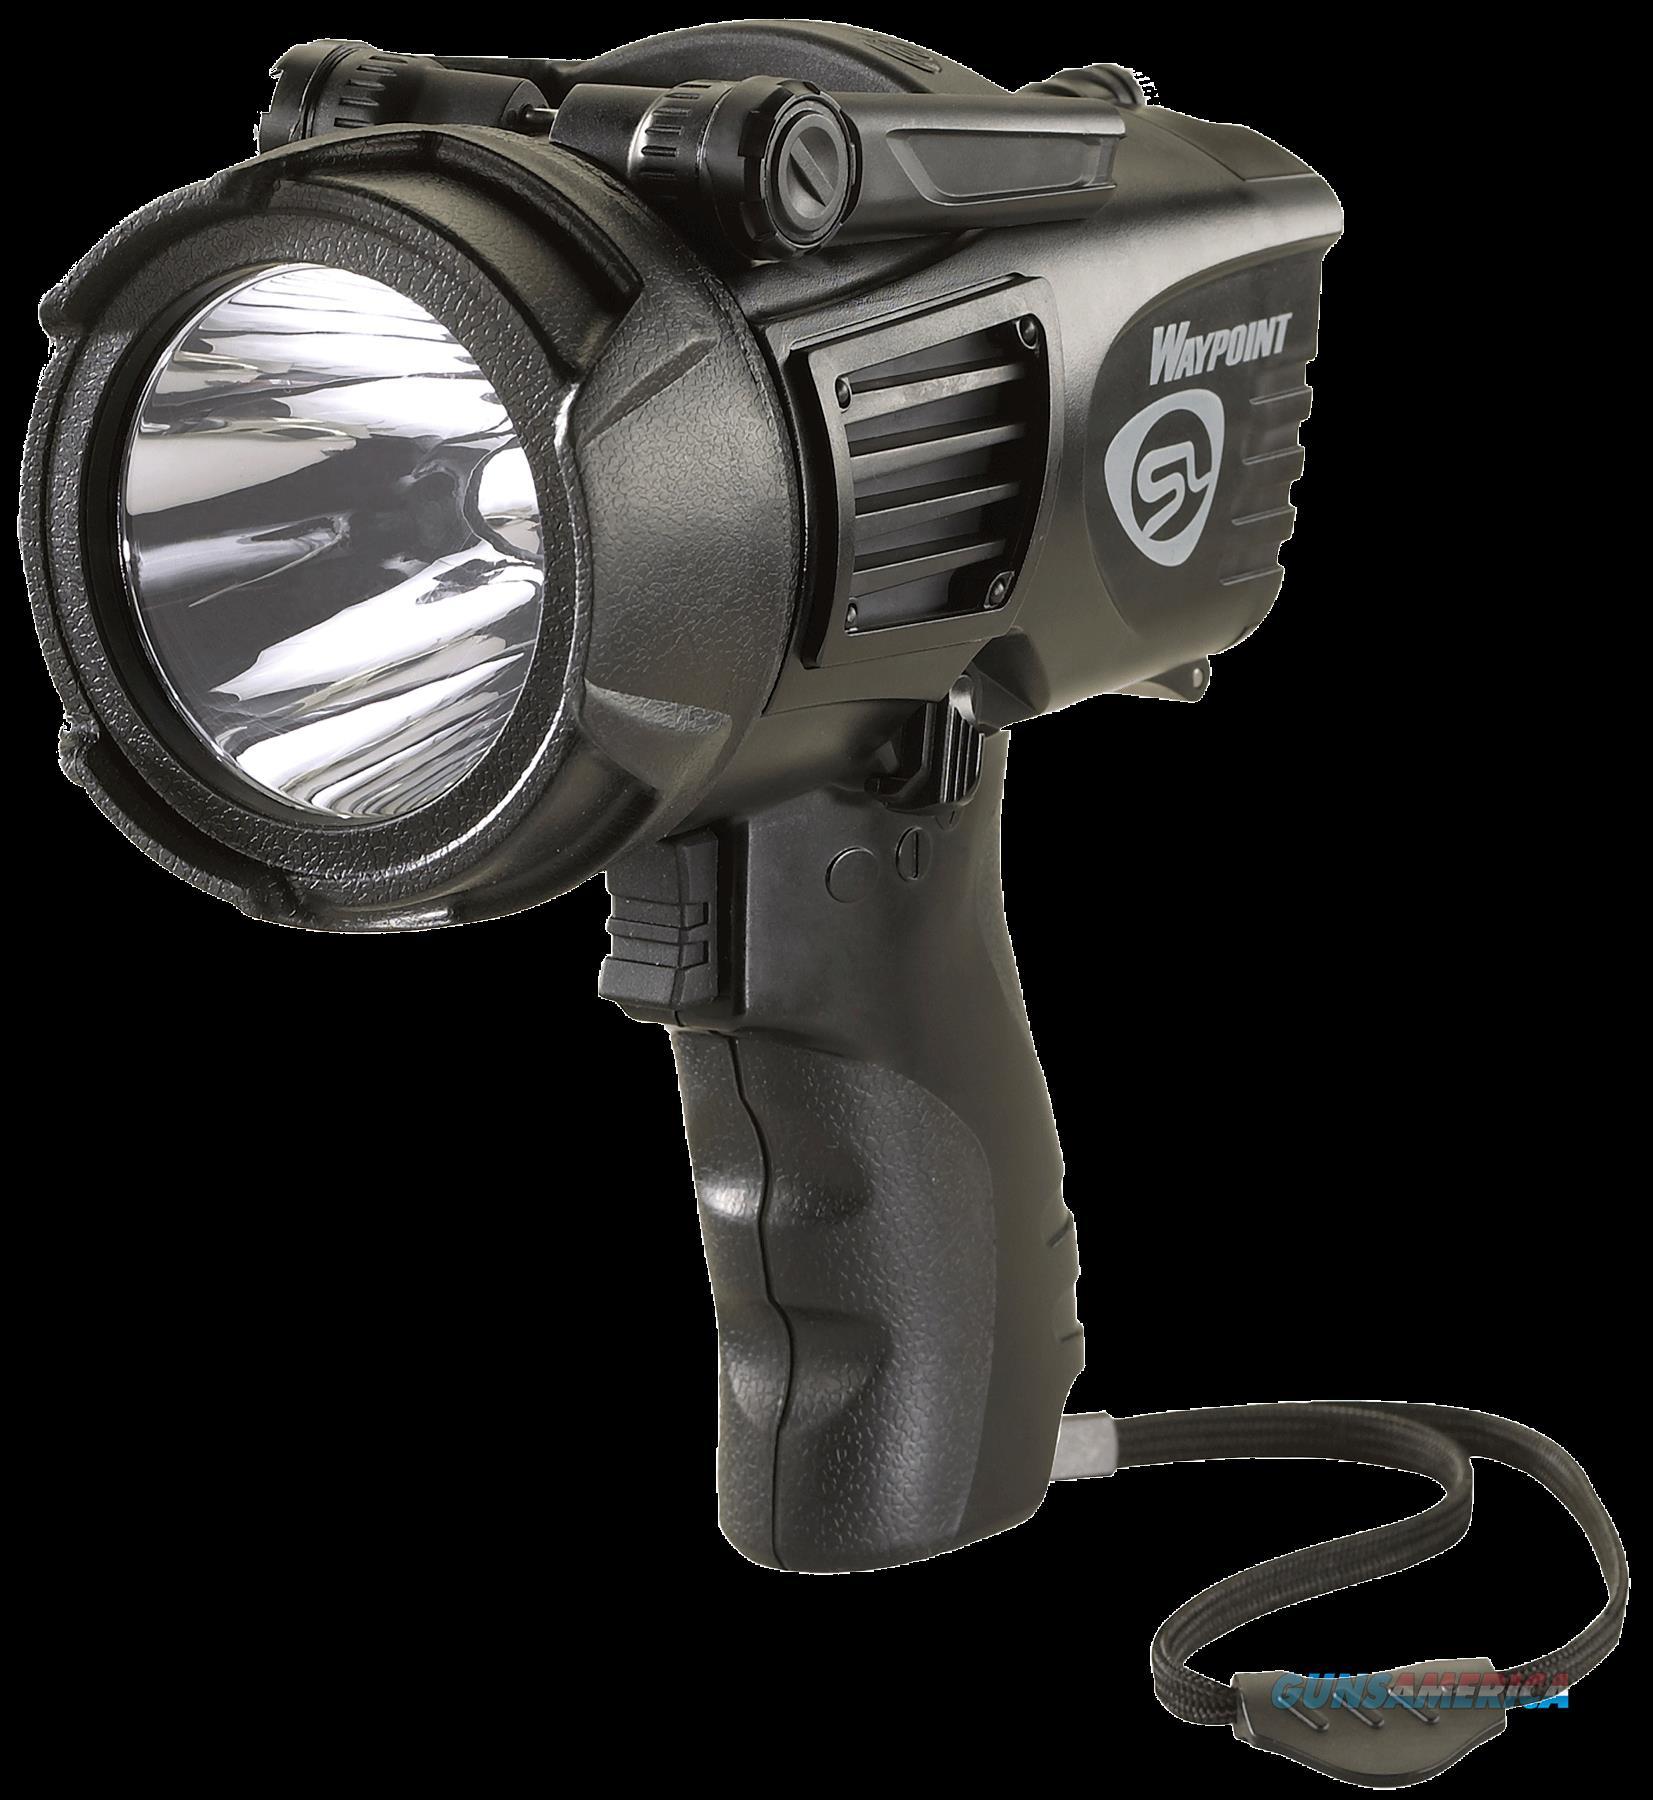 Streamlight Waypoint, Stl 44902  Waypoint Spotlight    Black  Guns > Pistols > 1911 Pistol Copies (non-Colt)